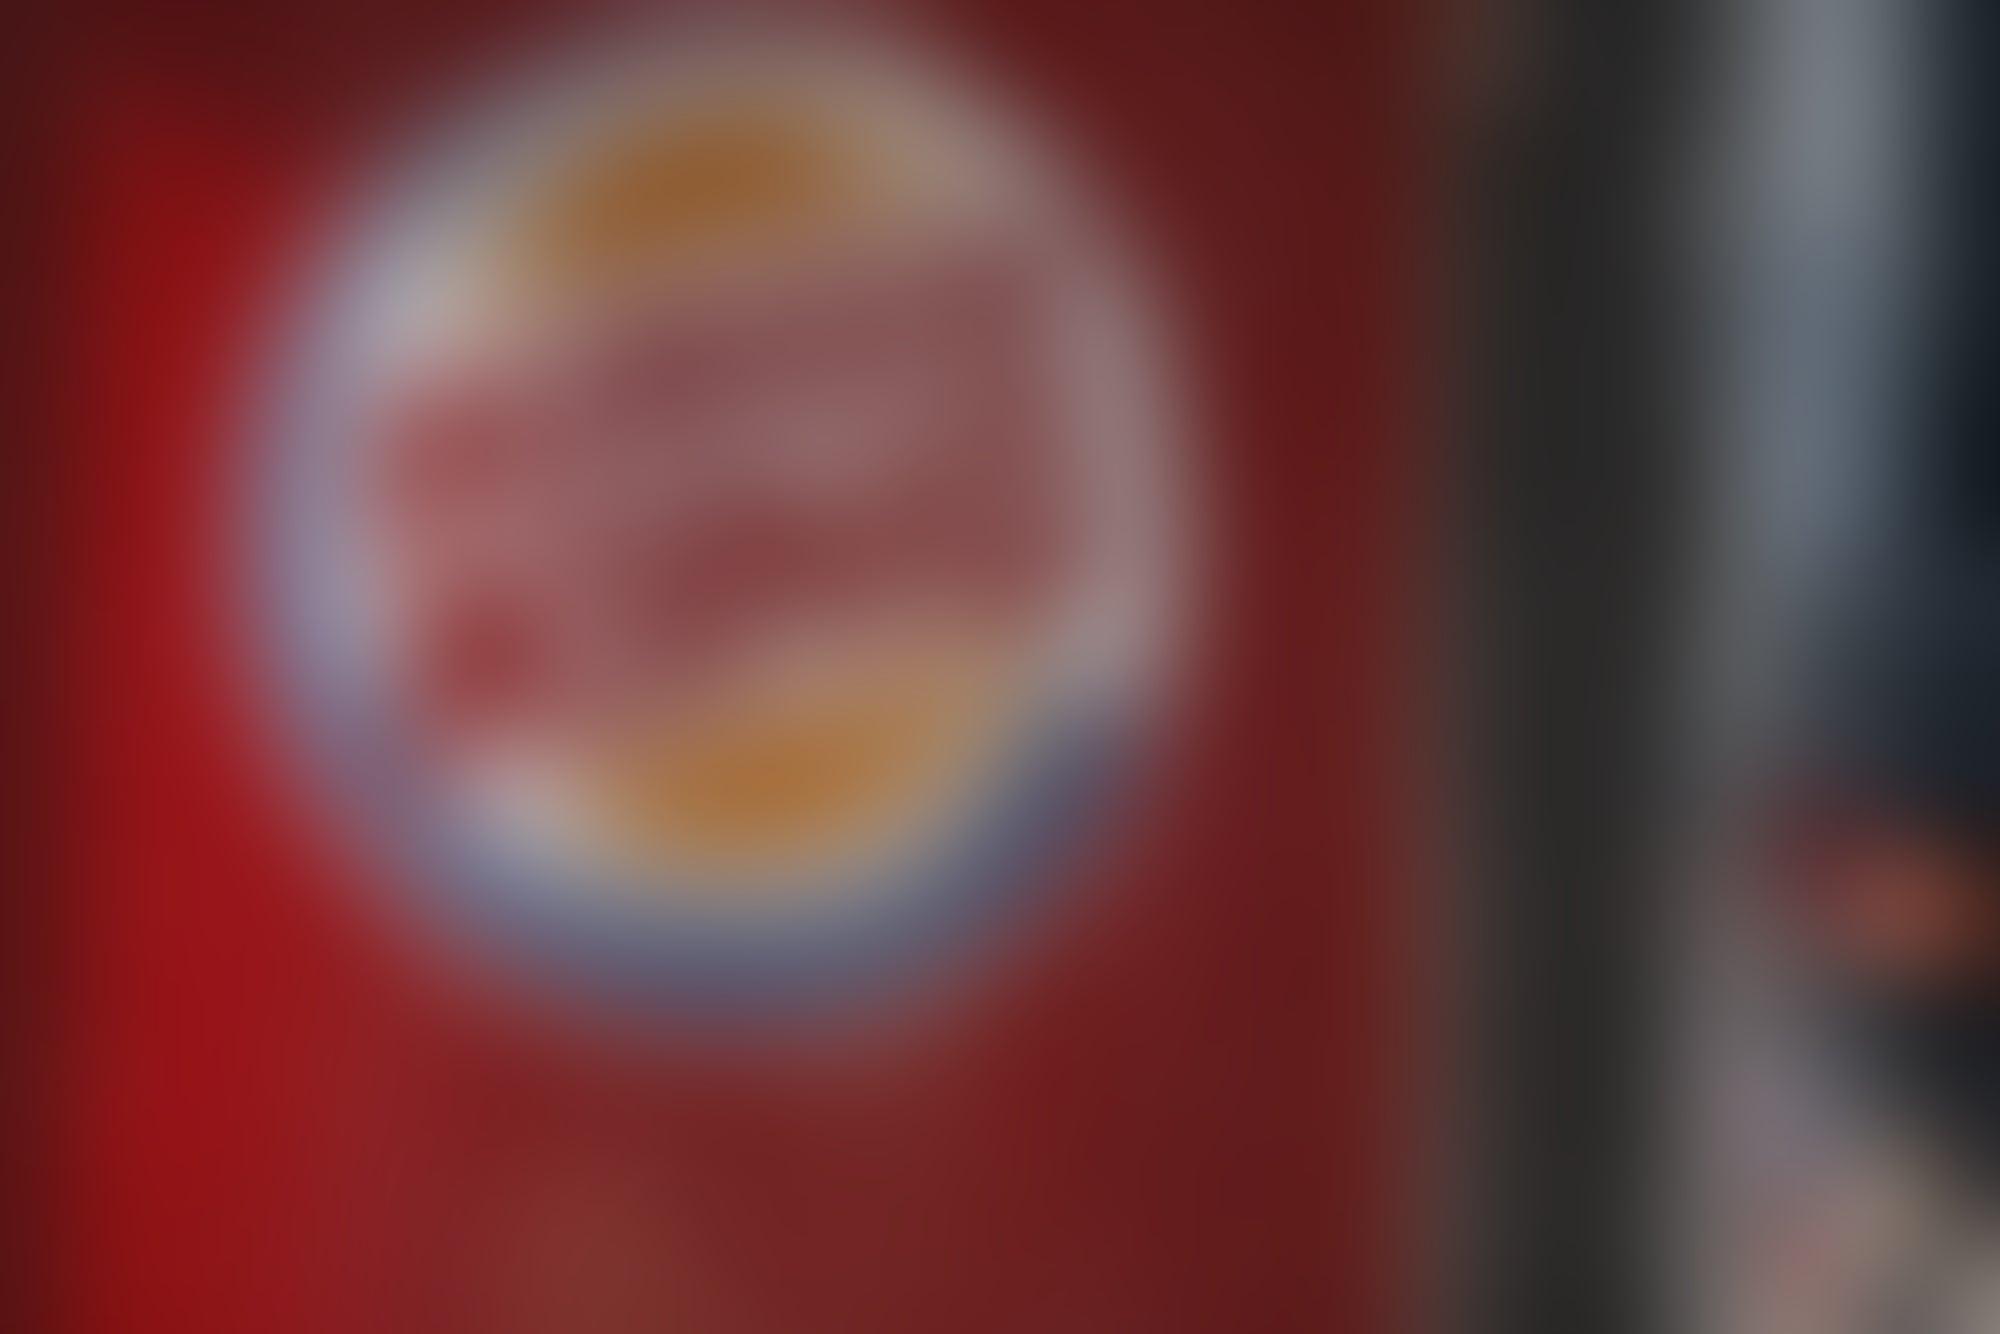 Burger King Founder Predicts Wage Hike Would End the 'Dollar Menu' Era